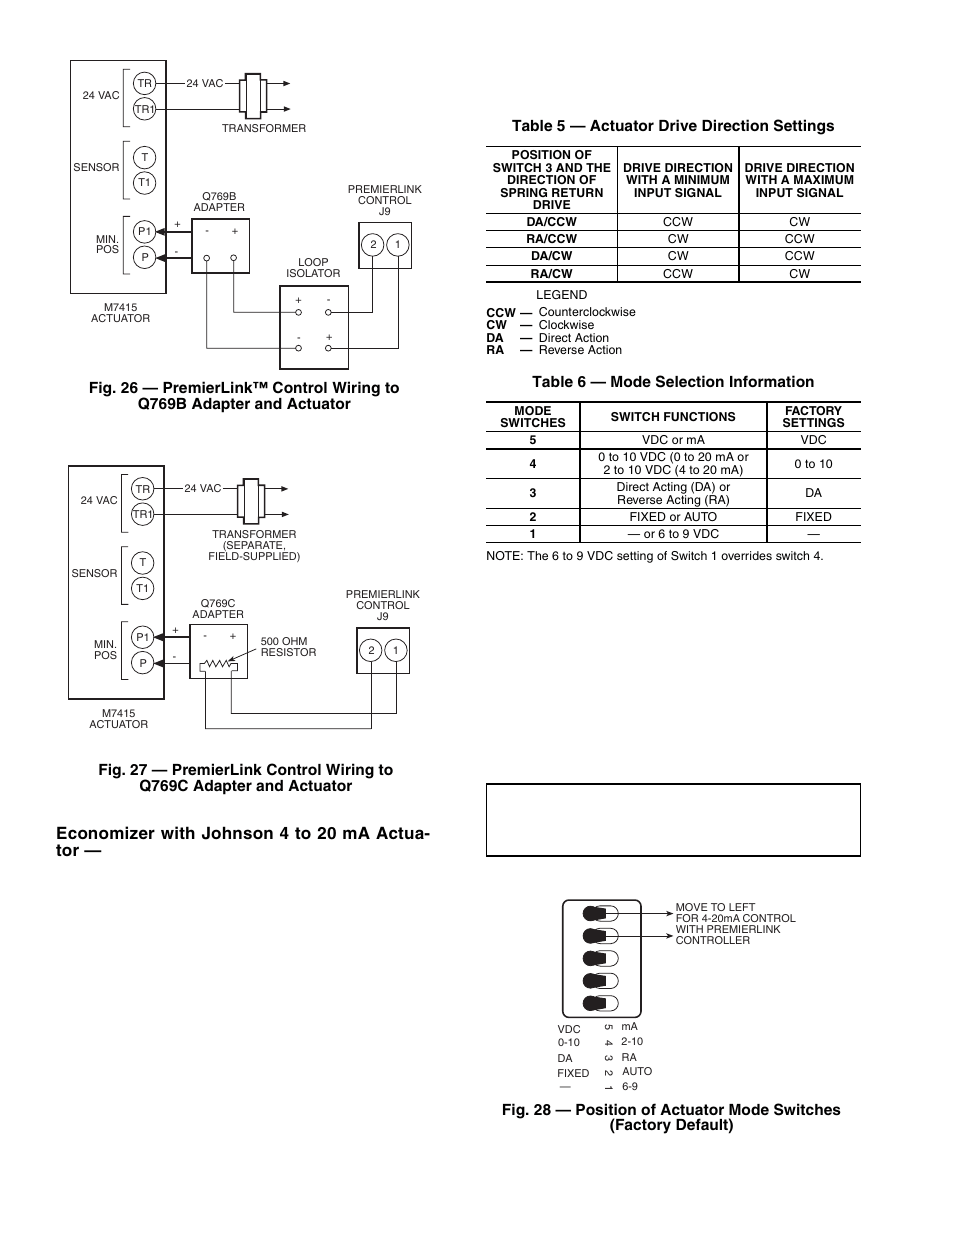 medium resolution of economizer with johnson 4 to 20 ma actua tor carrier premierlink 33cspremlk user manual